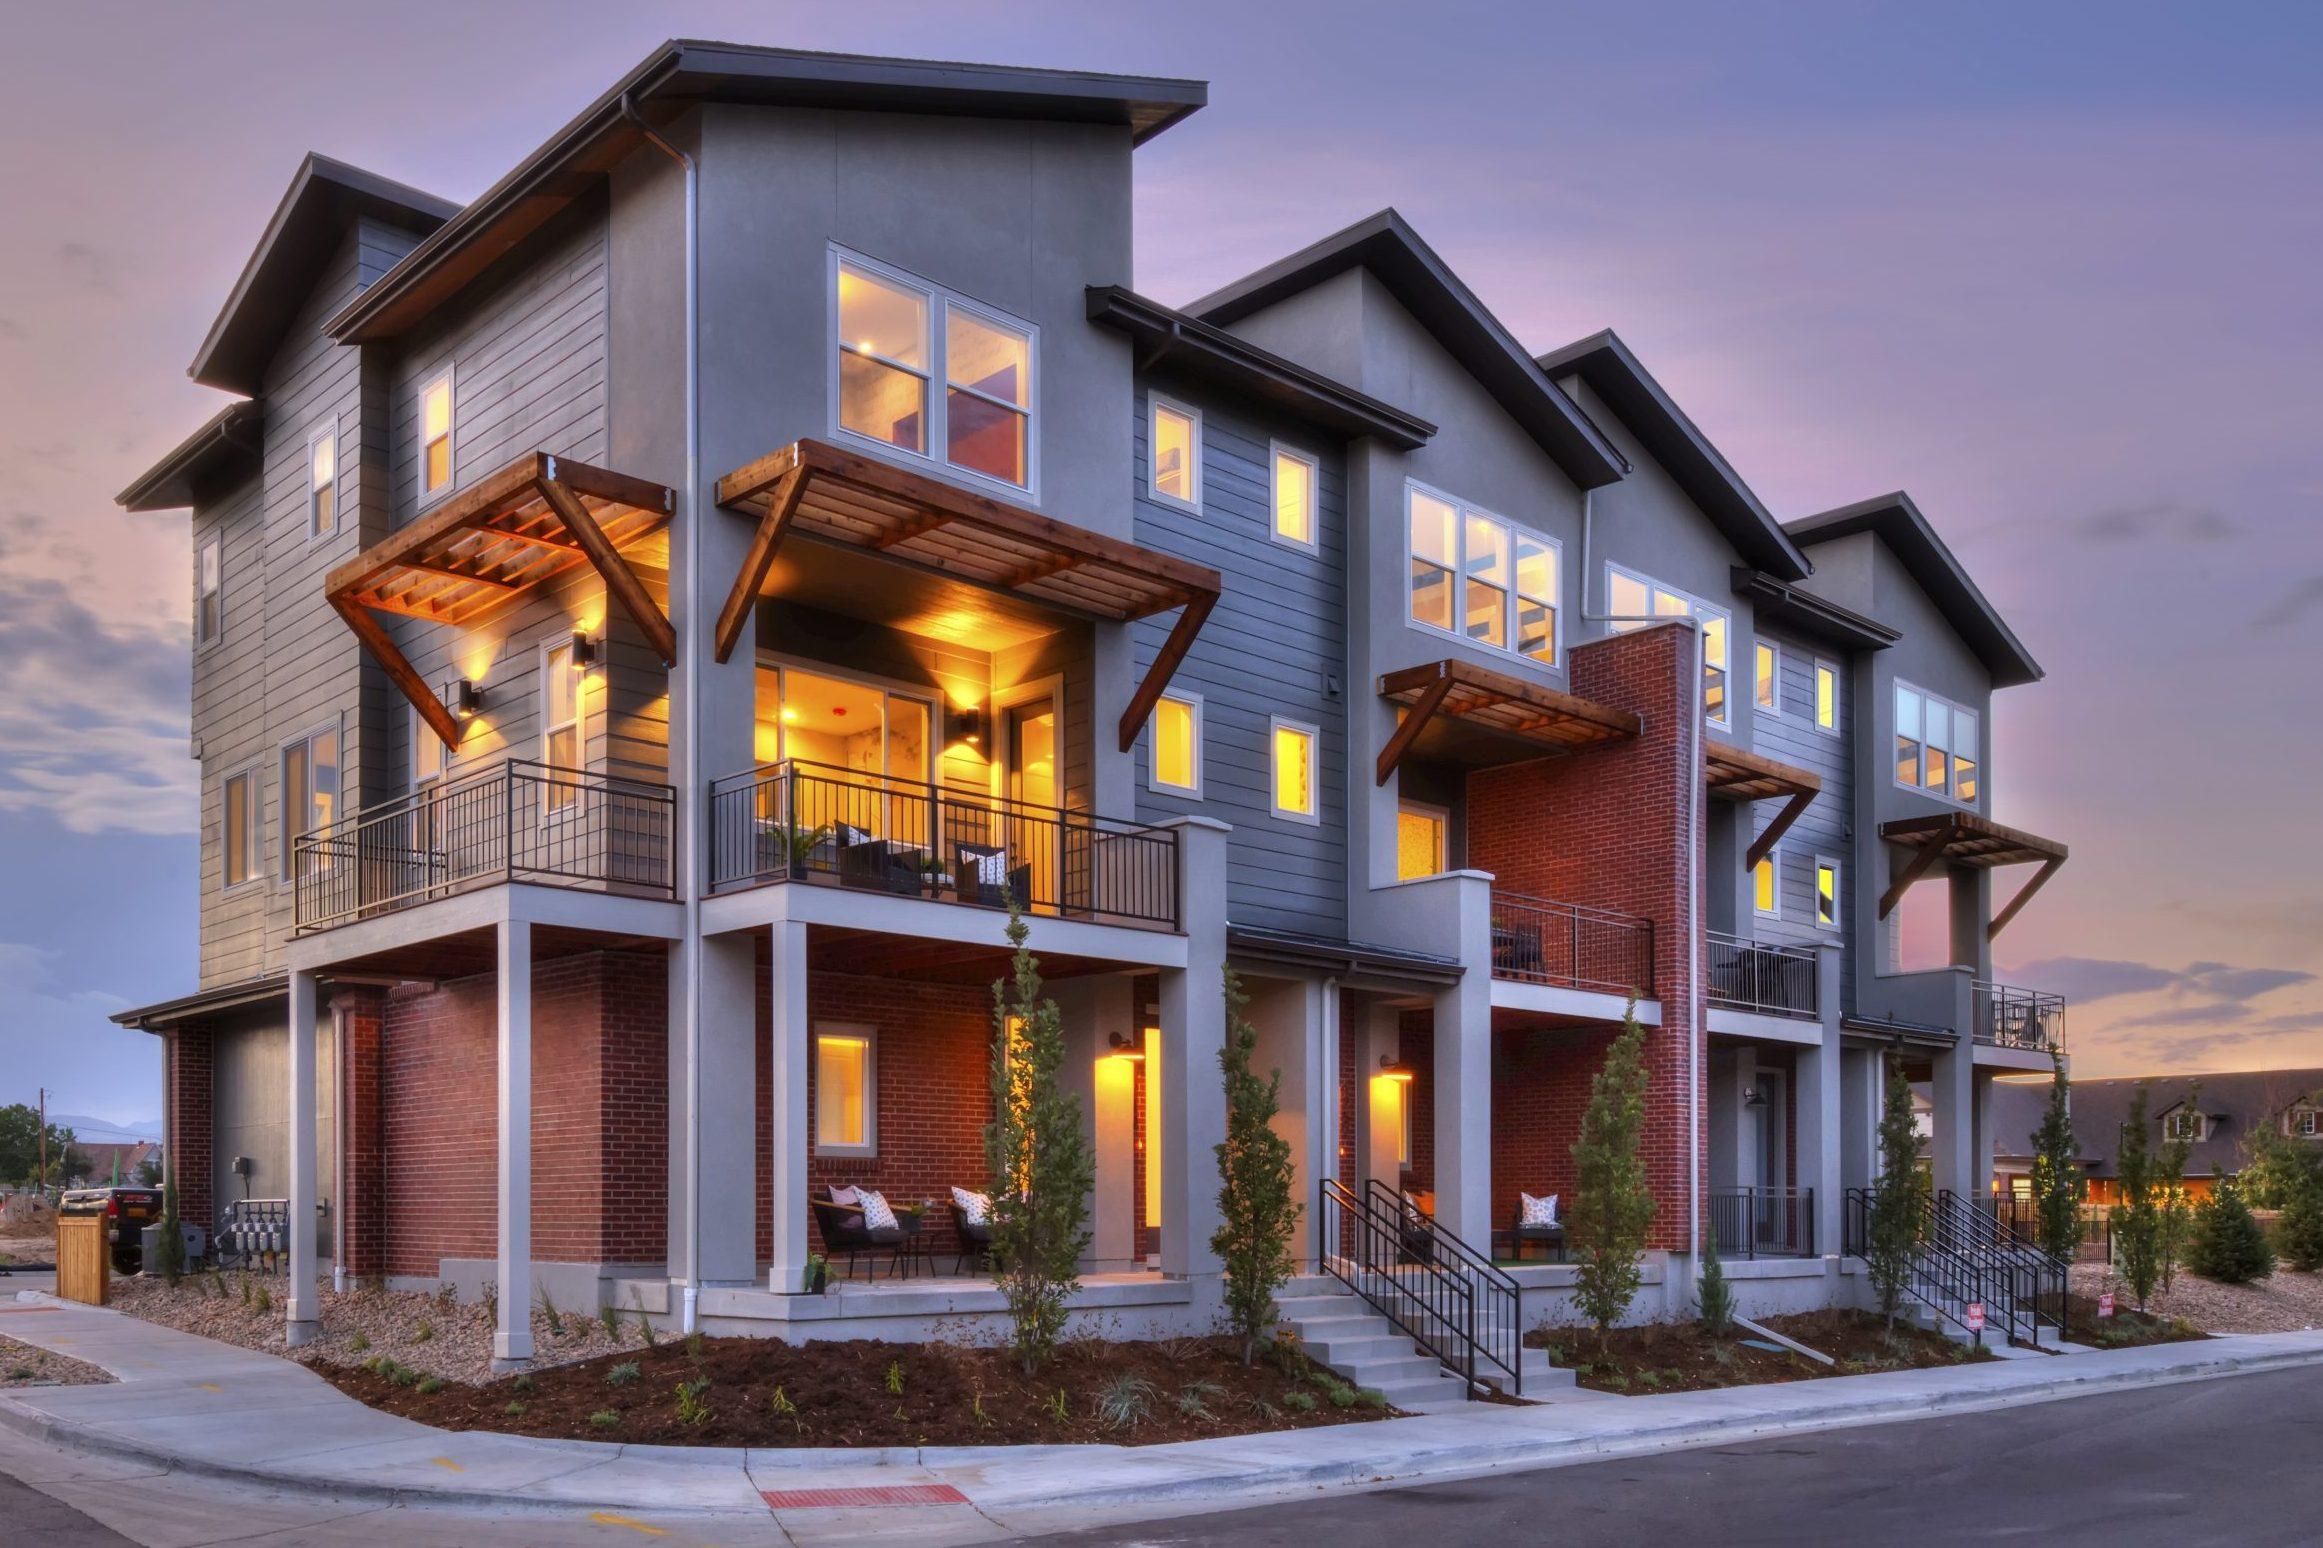 Colorado award winning architect town home design